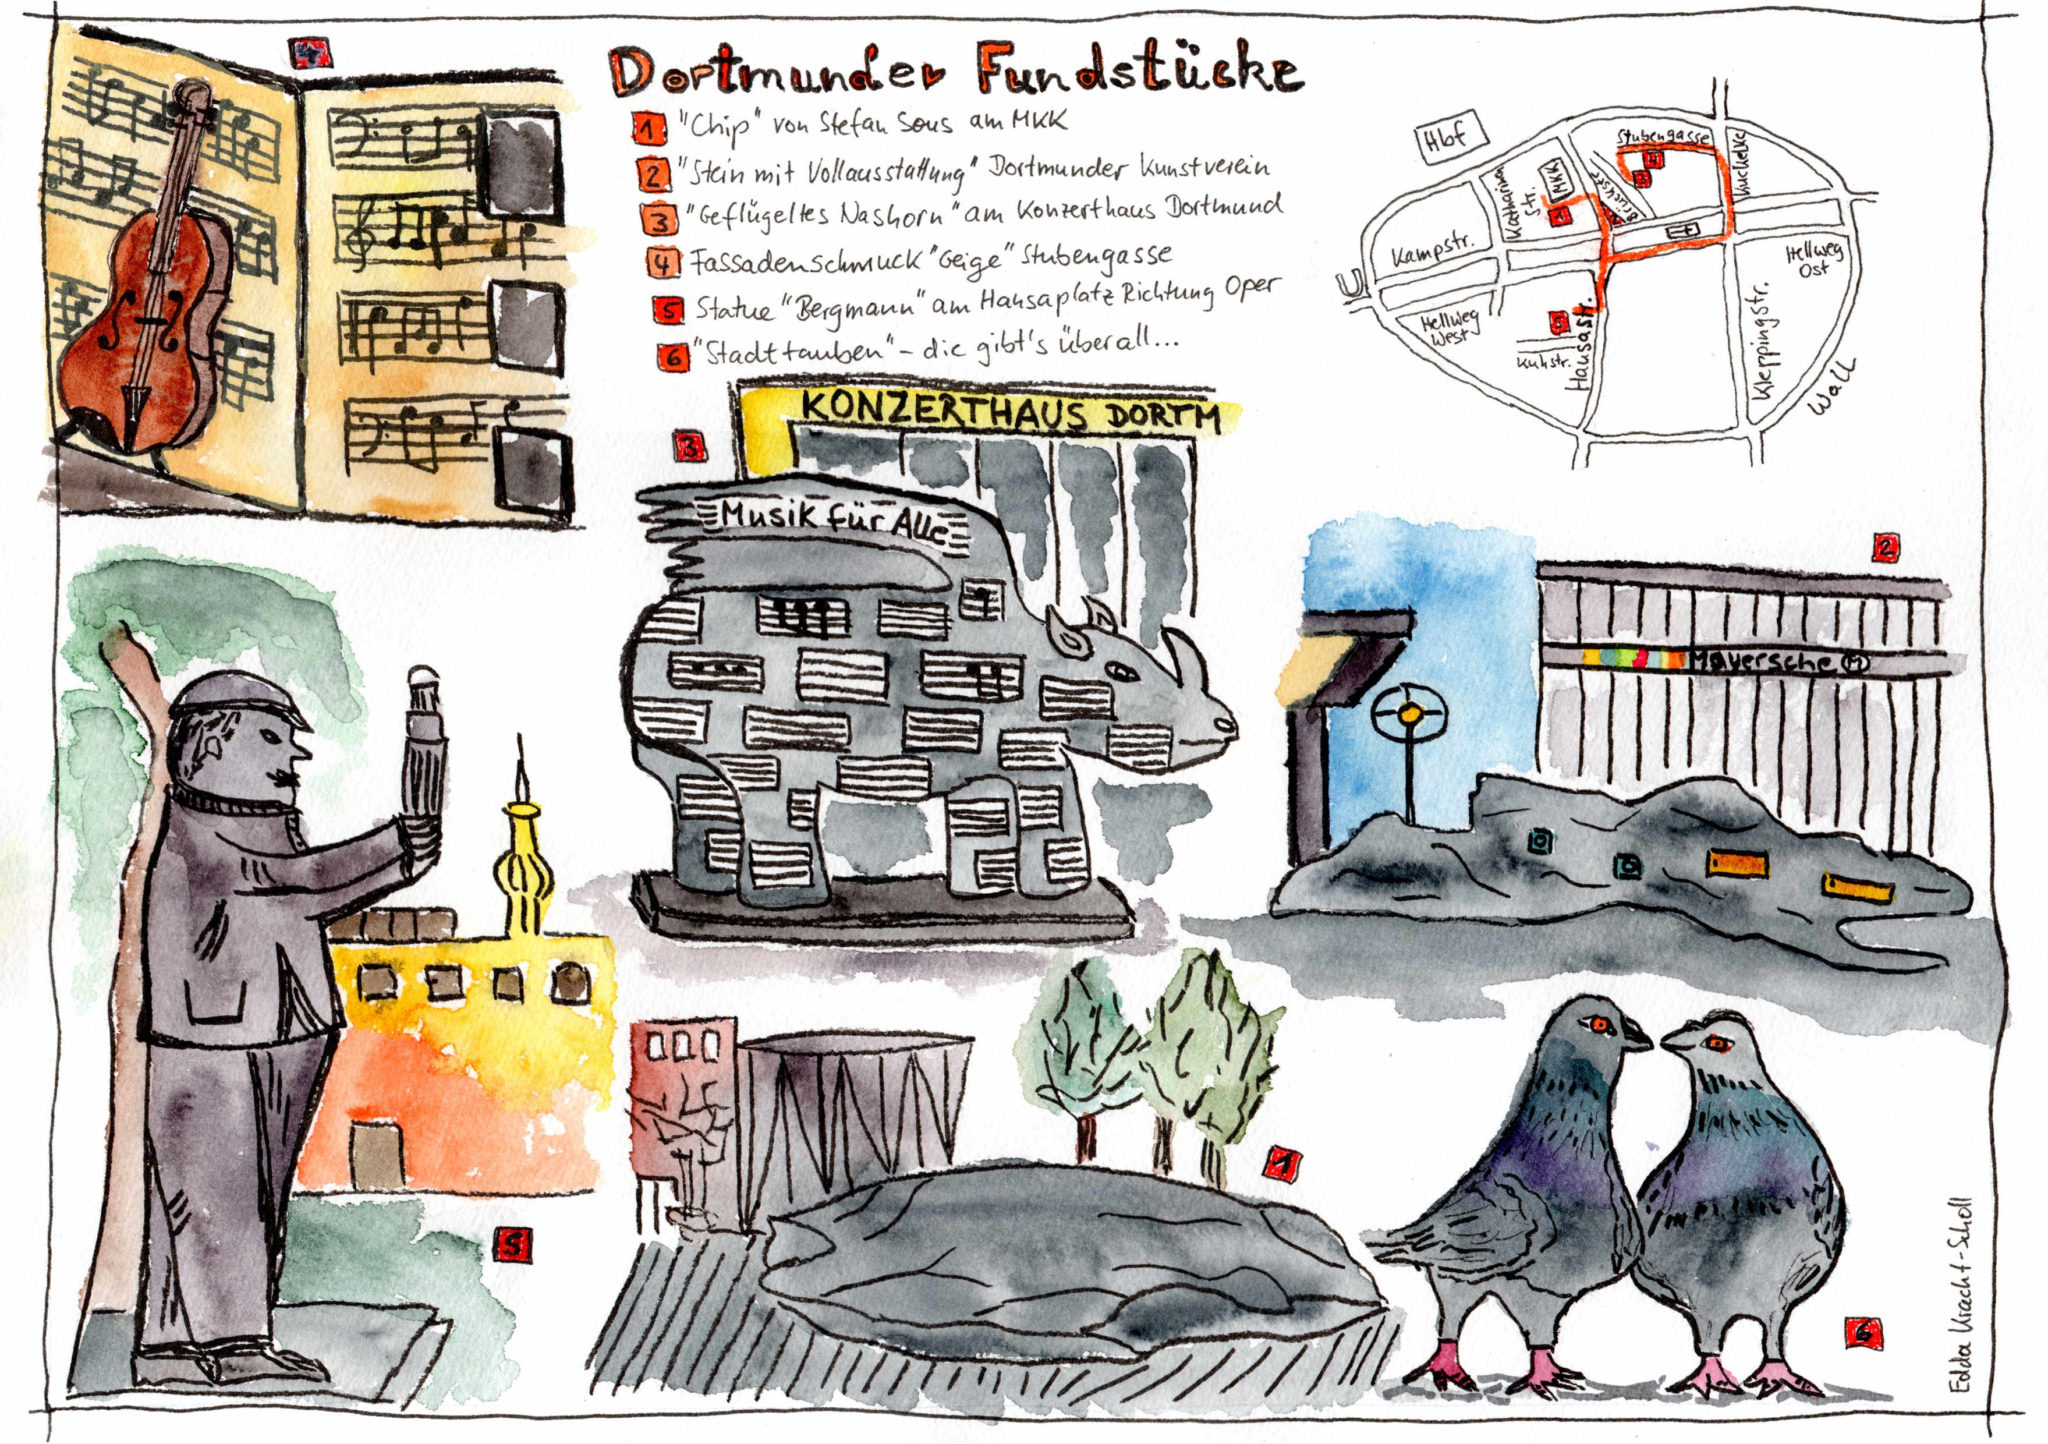 Dortmunder Fundstücke - Edda Kracht-Scholl